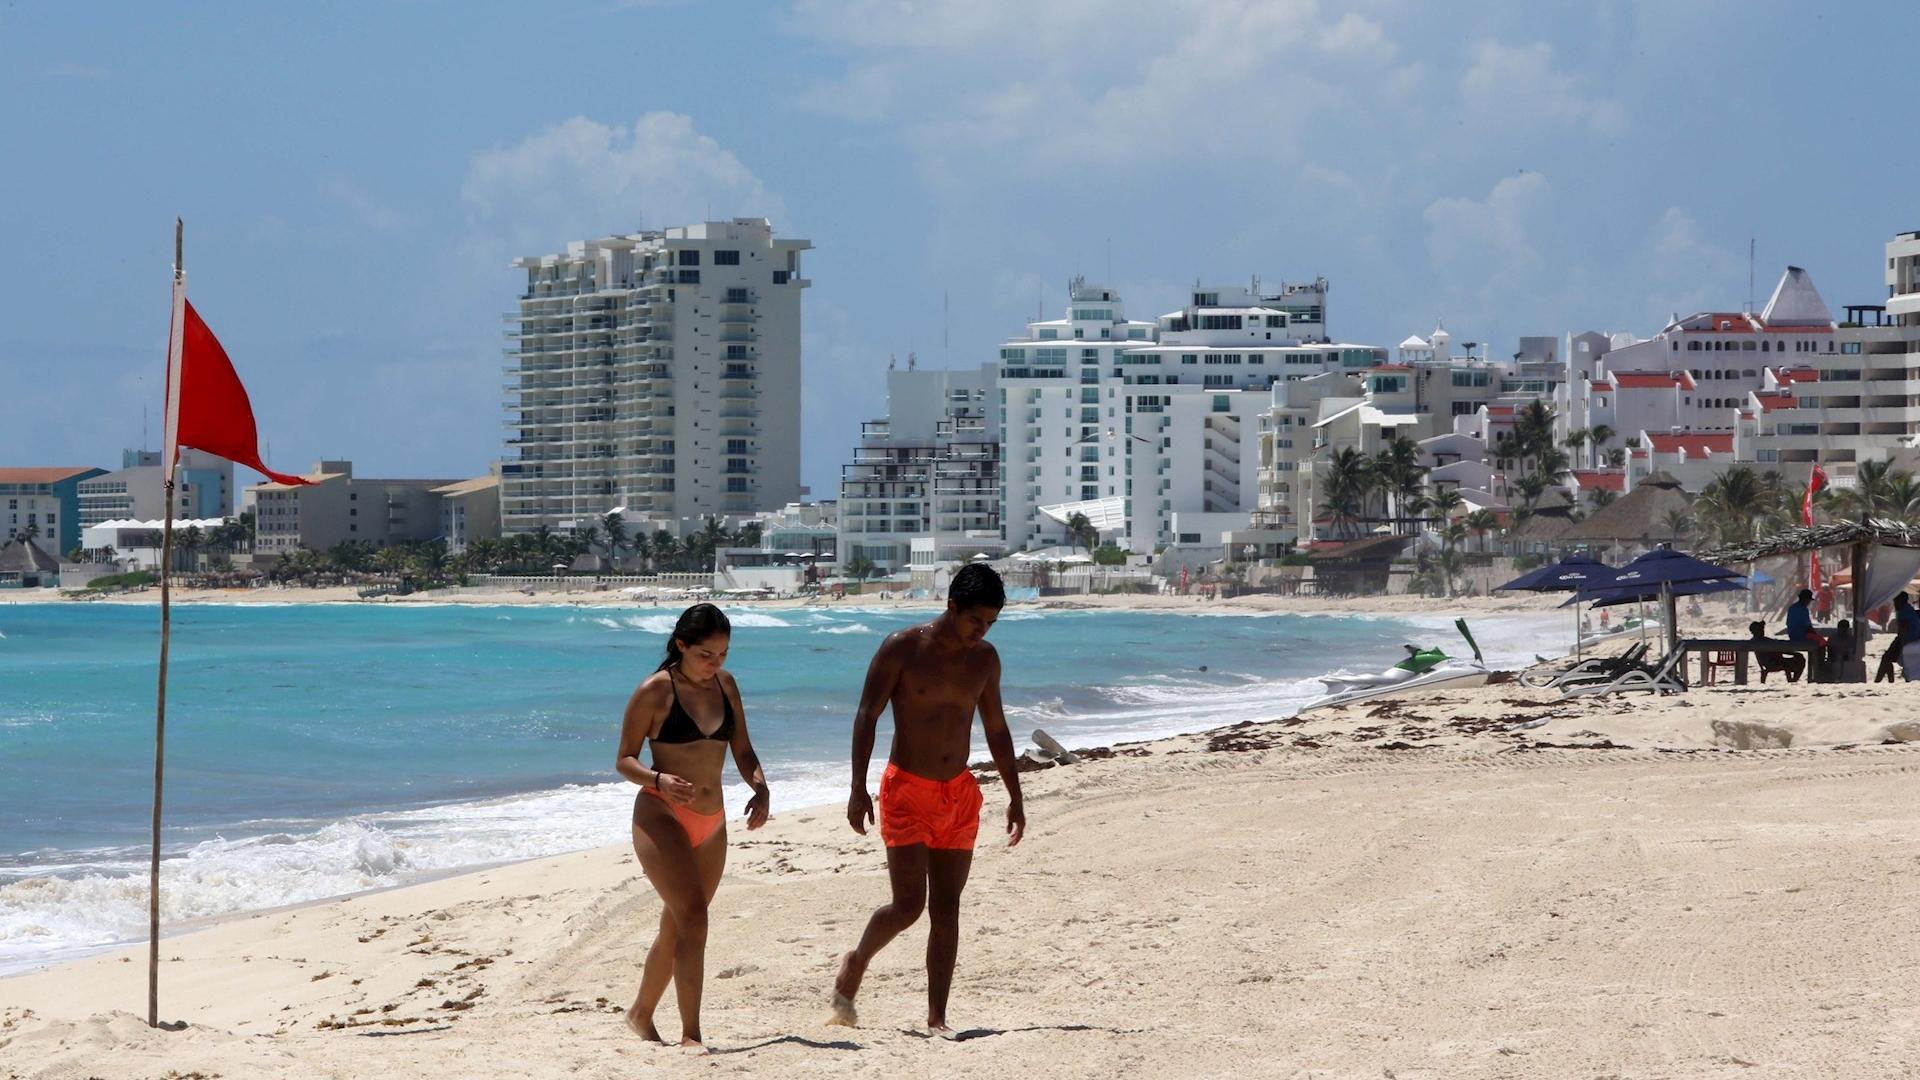 Playa Cancún Quintana Roo reapertura